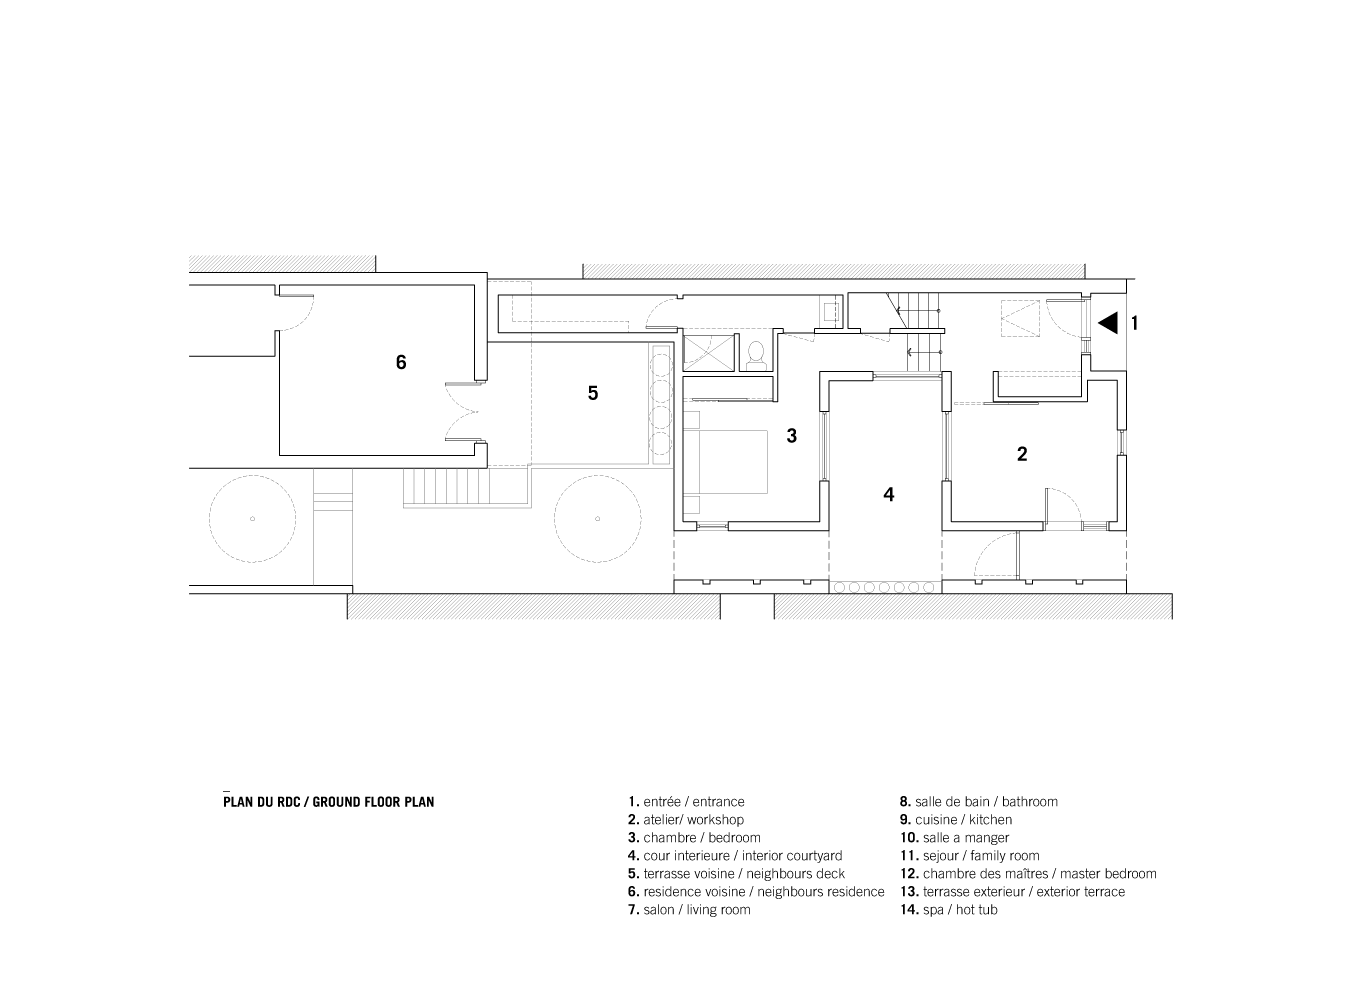 st-christoph-11